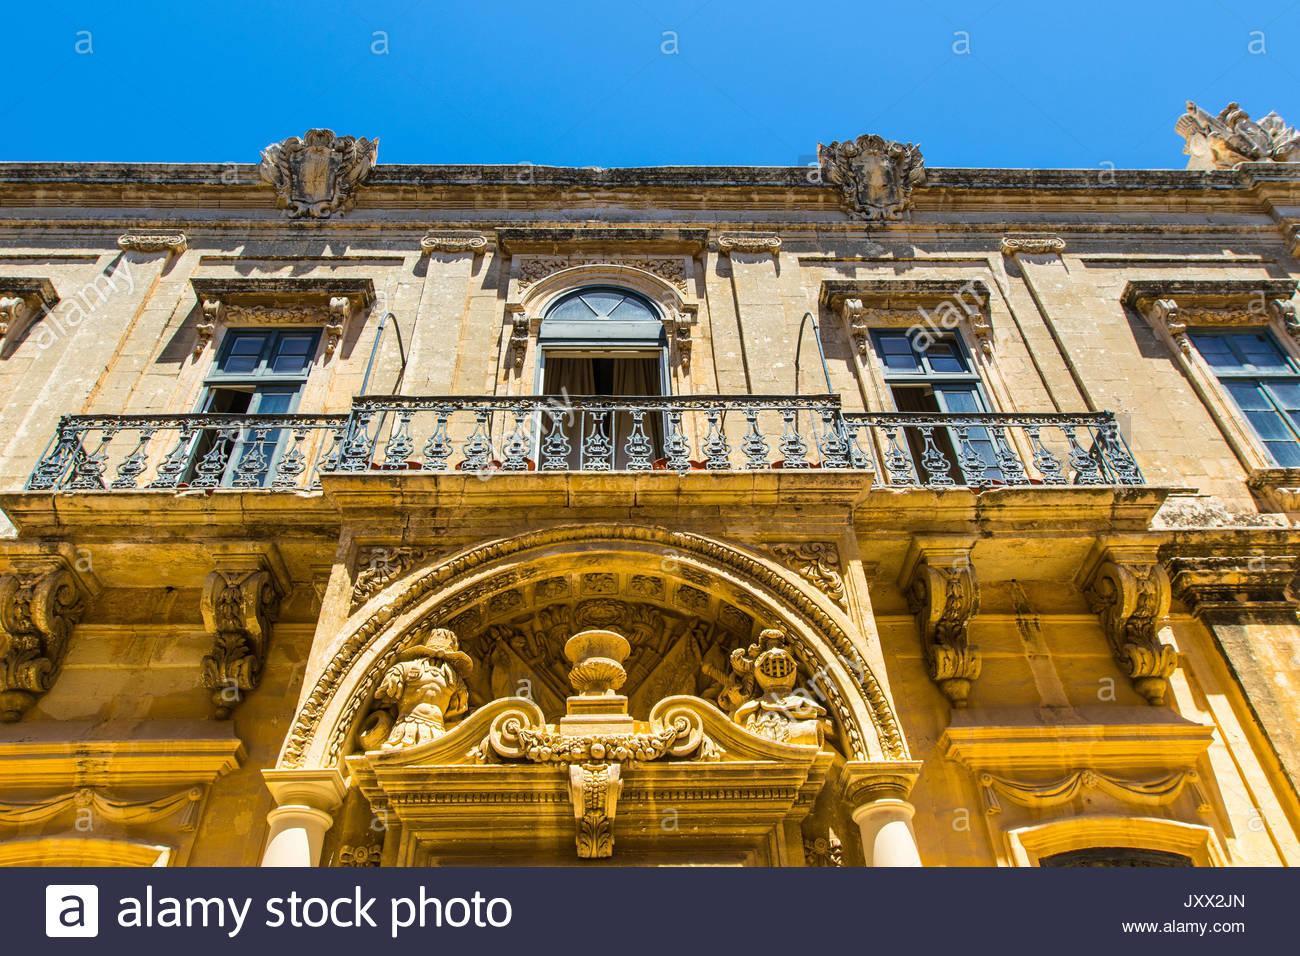 balcony in mdina, malta - Stock Image